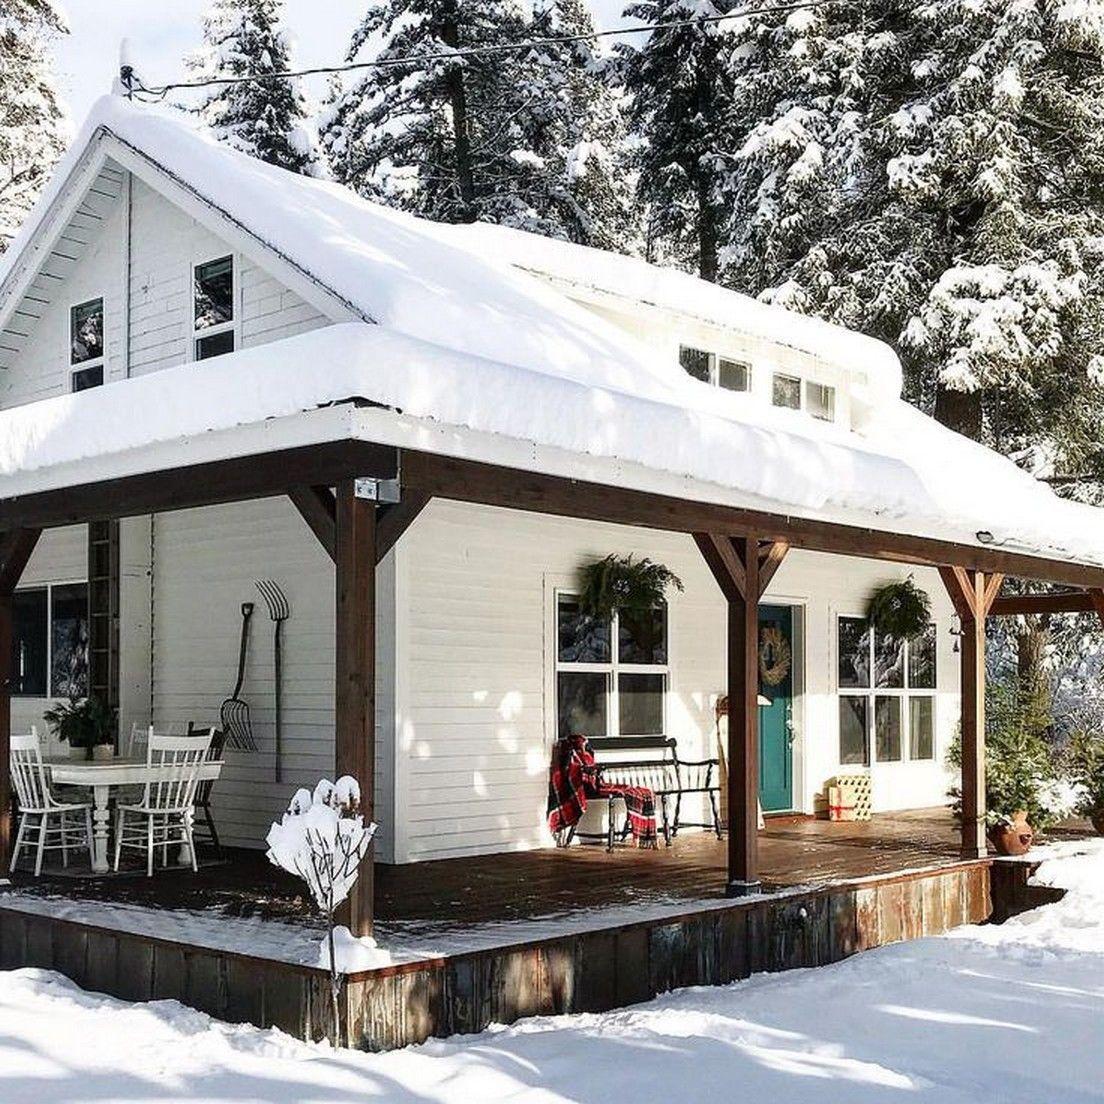 44 elegant farmhouse design ideas to give beautiful look 1 on beautiful modern farmhouse trending exterior design ideas id=84102